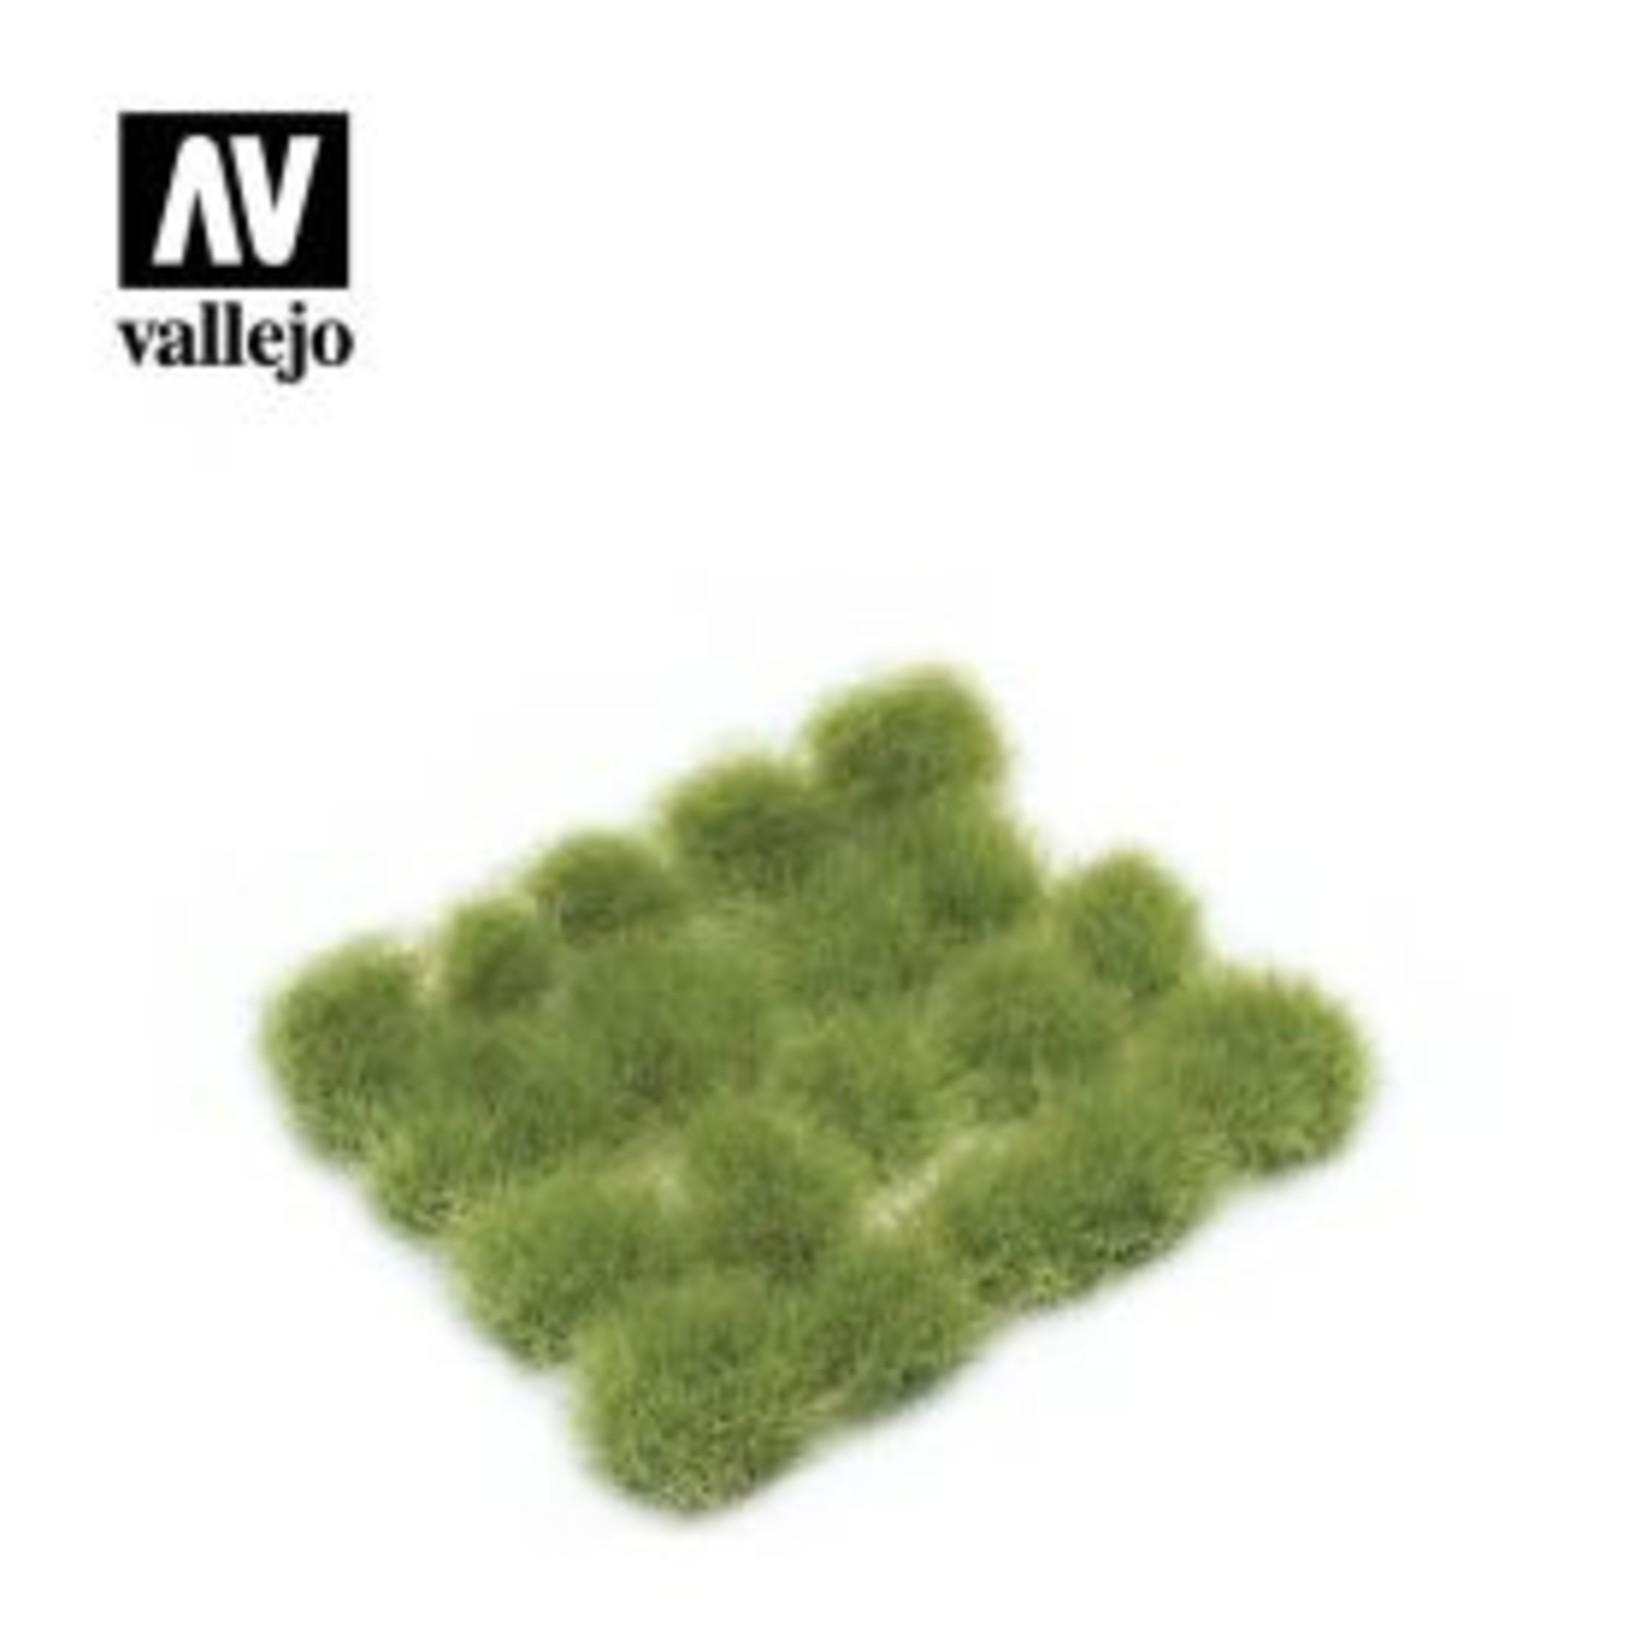 Vallejo Vallejo Scenery: Wild Tuft: Light Green: Extra Large